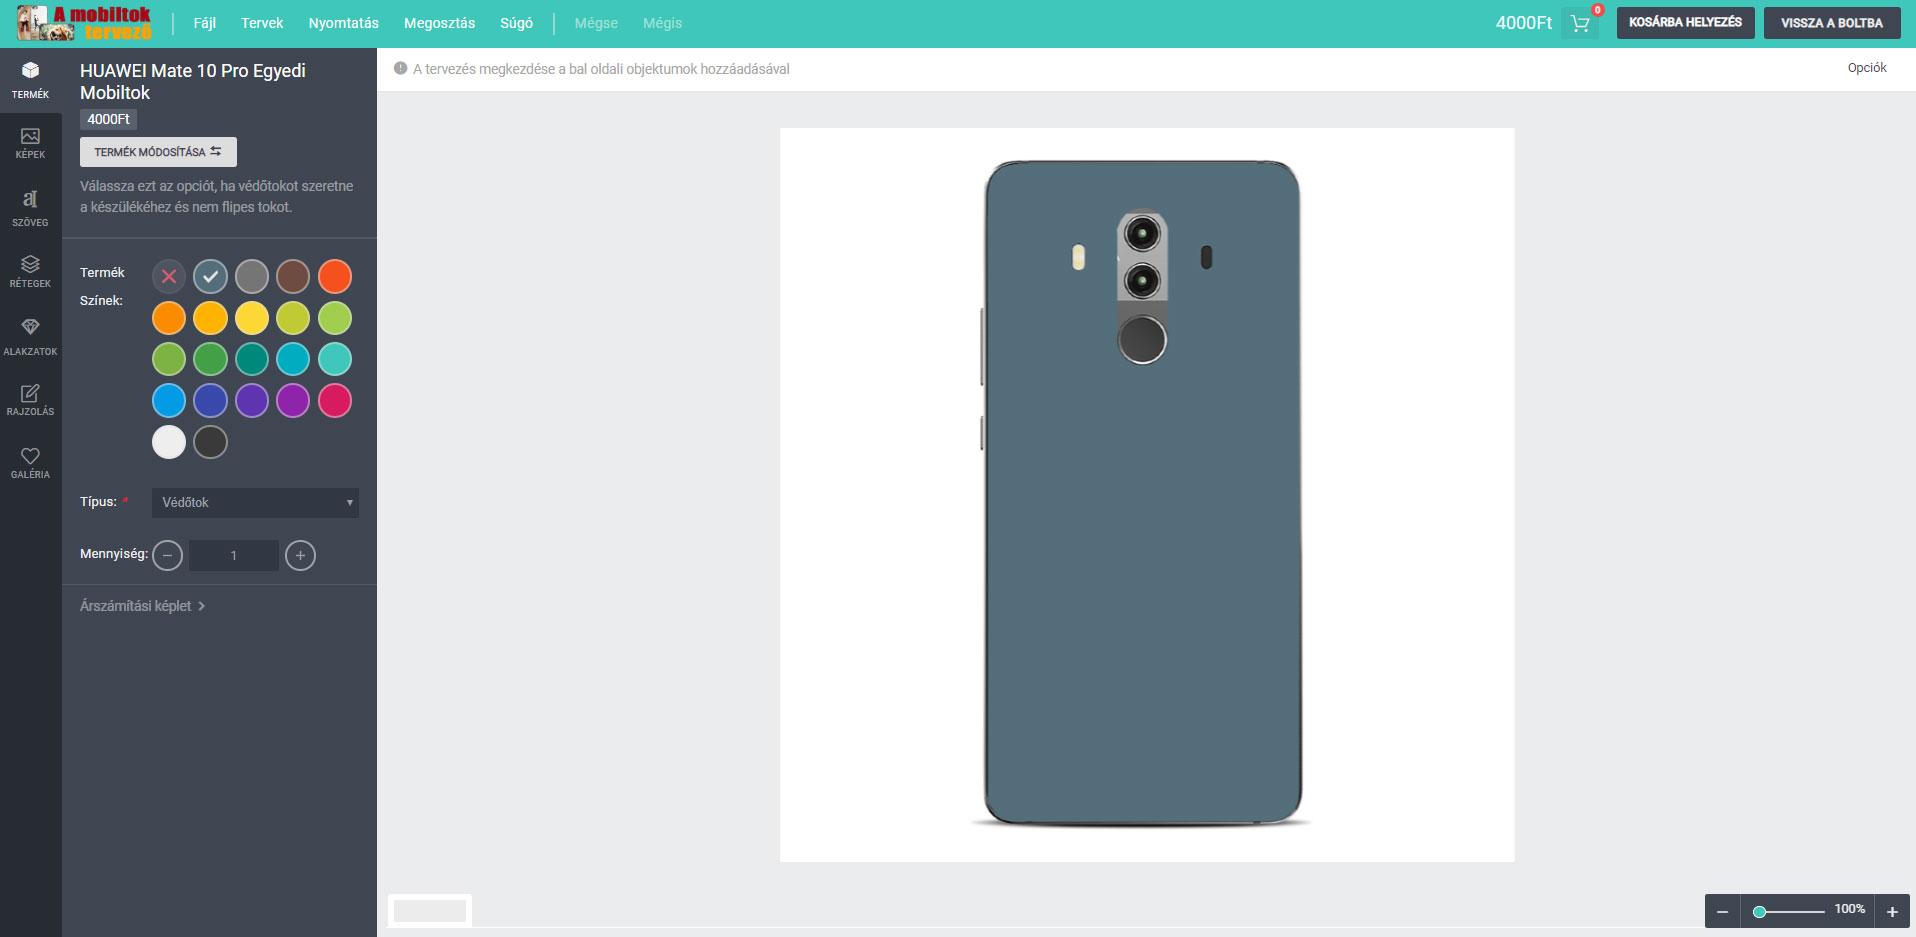 Huawei Mate 10 Pro egyedi mobiltok tervező